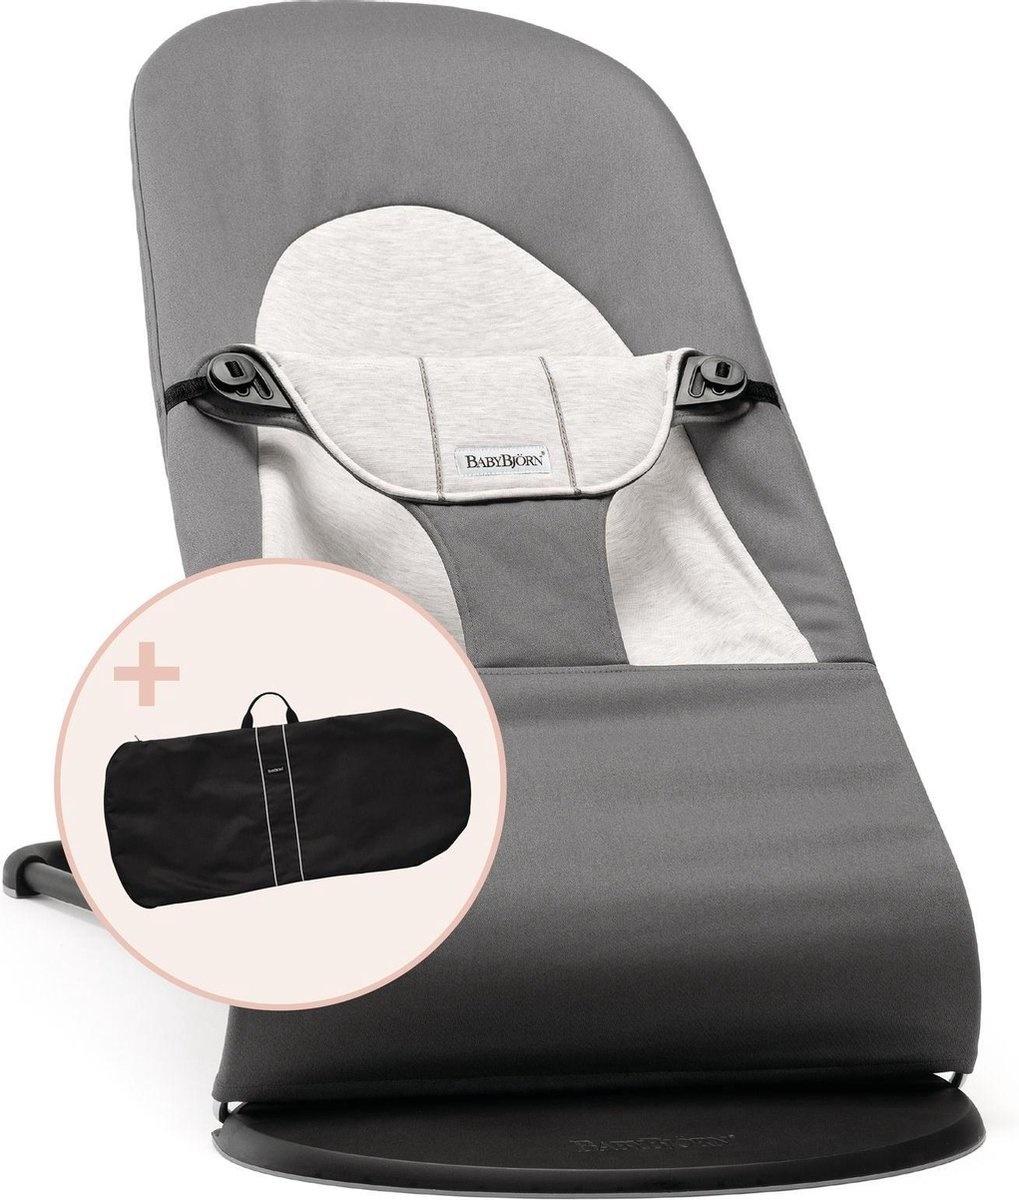 BABYBJÖRN BABYBJÖRN Wipstoeltje Balance Soft Donkergrijs Grijs Cotton/Jersey met Transporttas Zwart